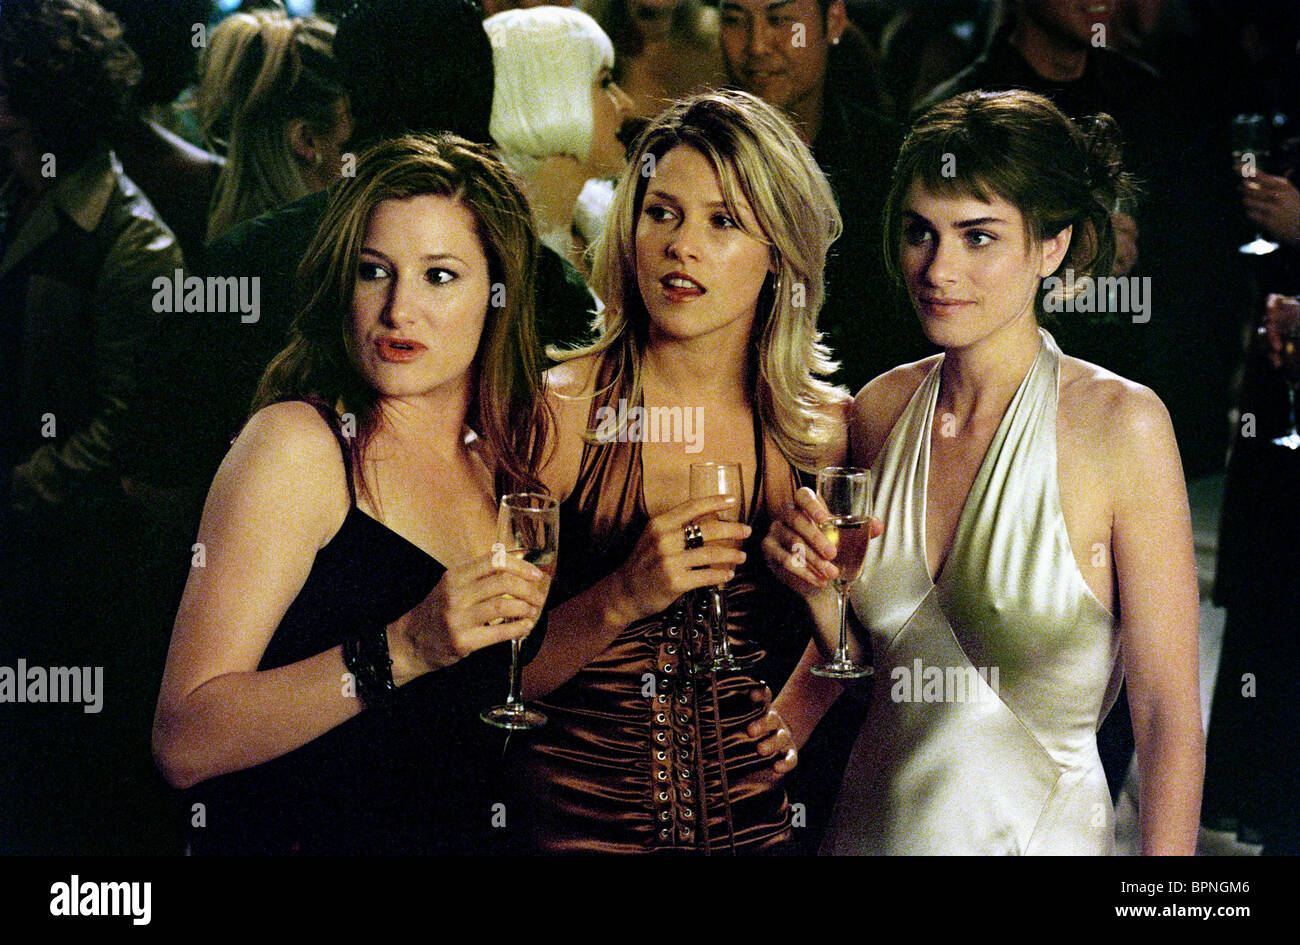 Amanda Peet A Lot Like Love kathryn hahn, ali larter, amanda peet, a lot like love, 2005